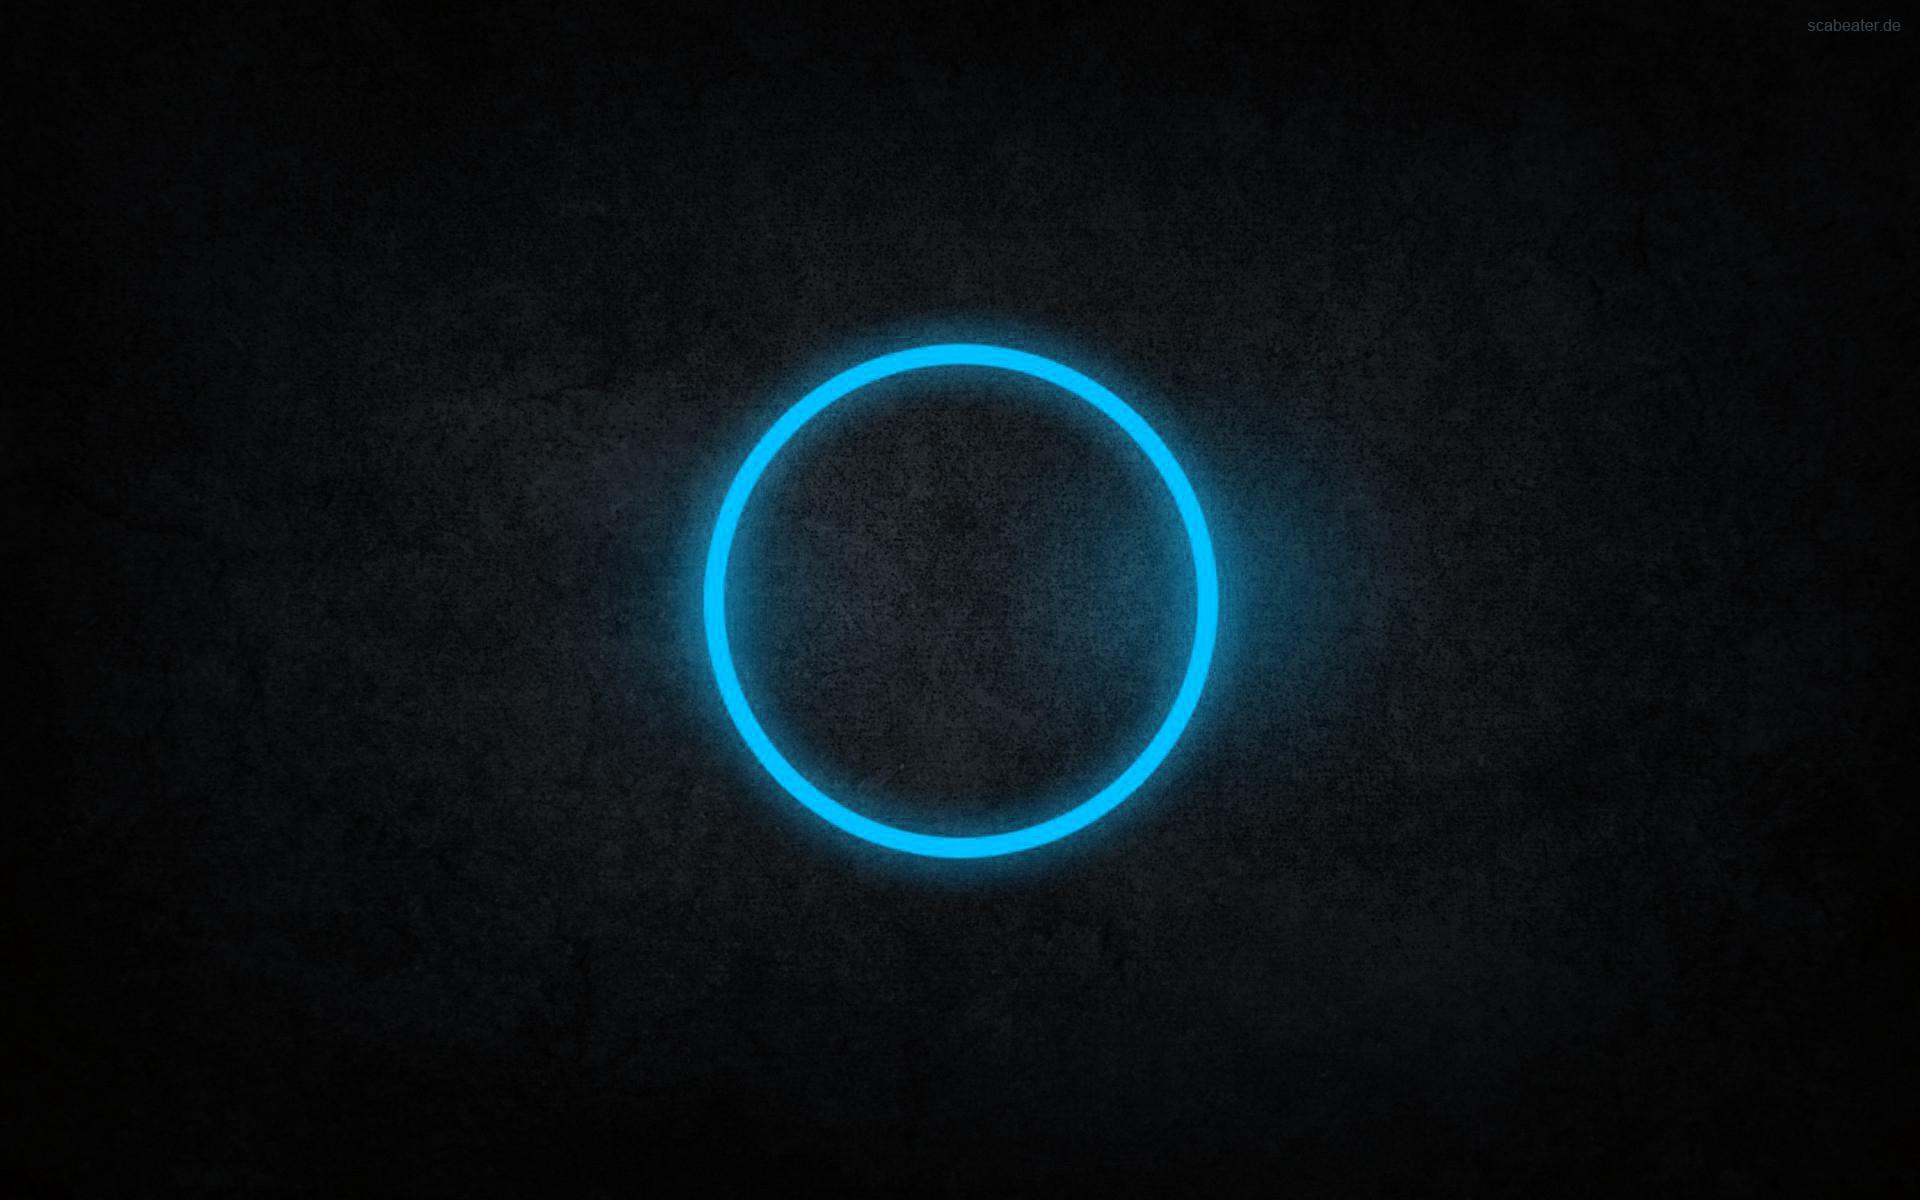 Abstract blue black dark circles rings cyan neon art wallpaper 1920x1200